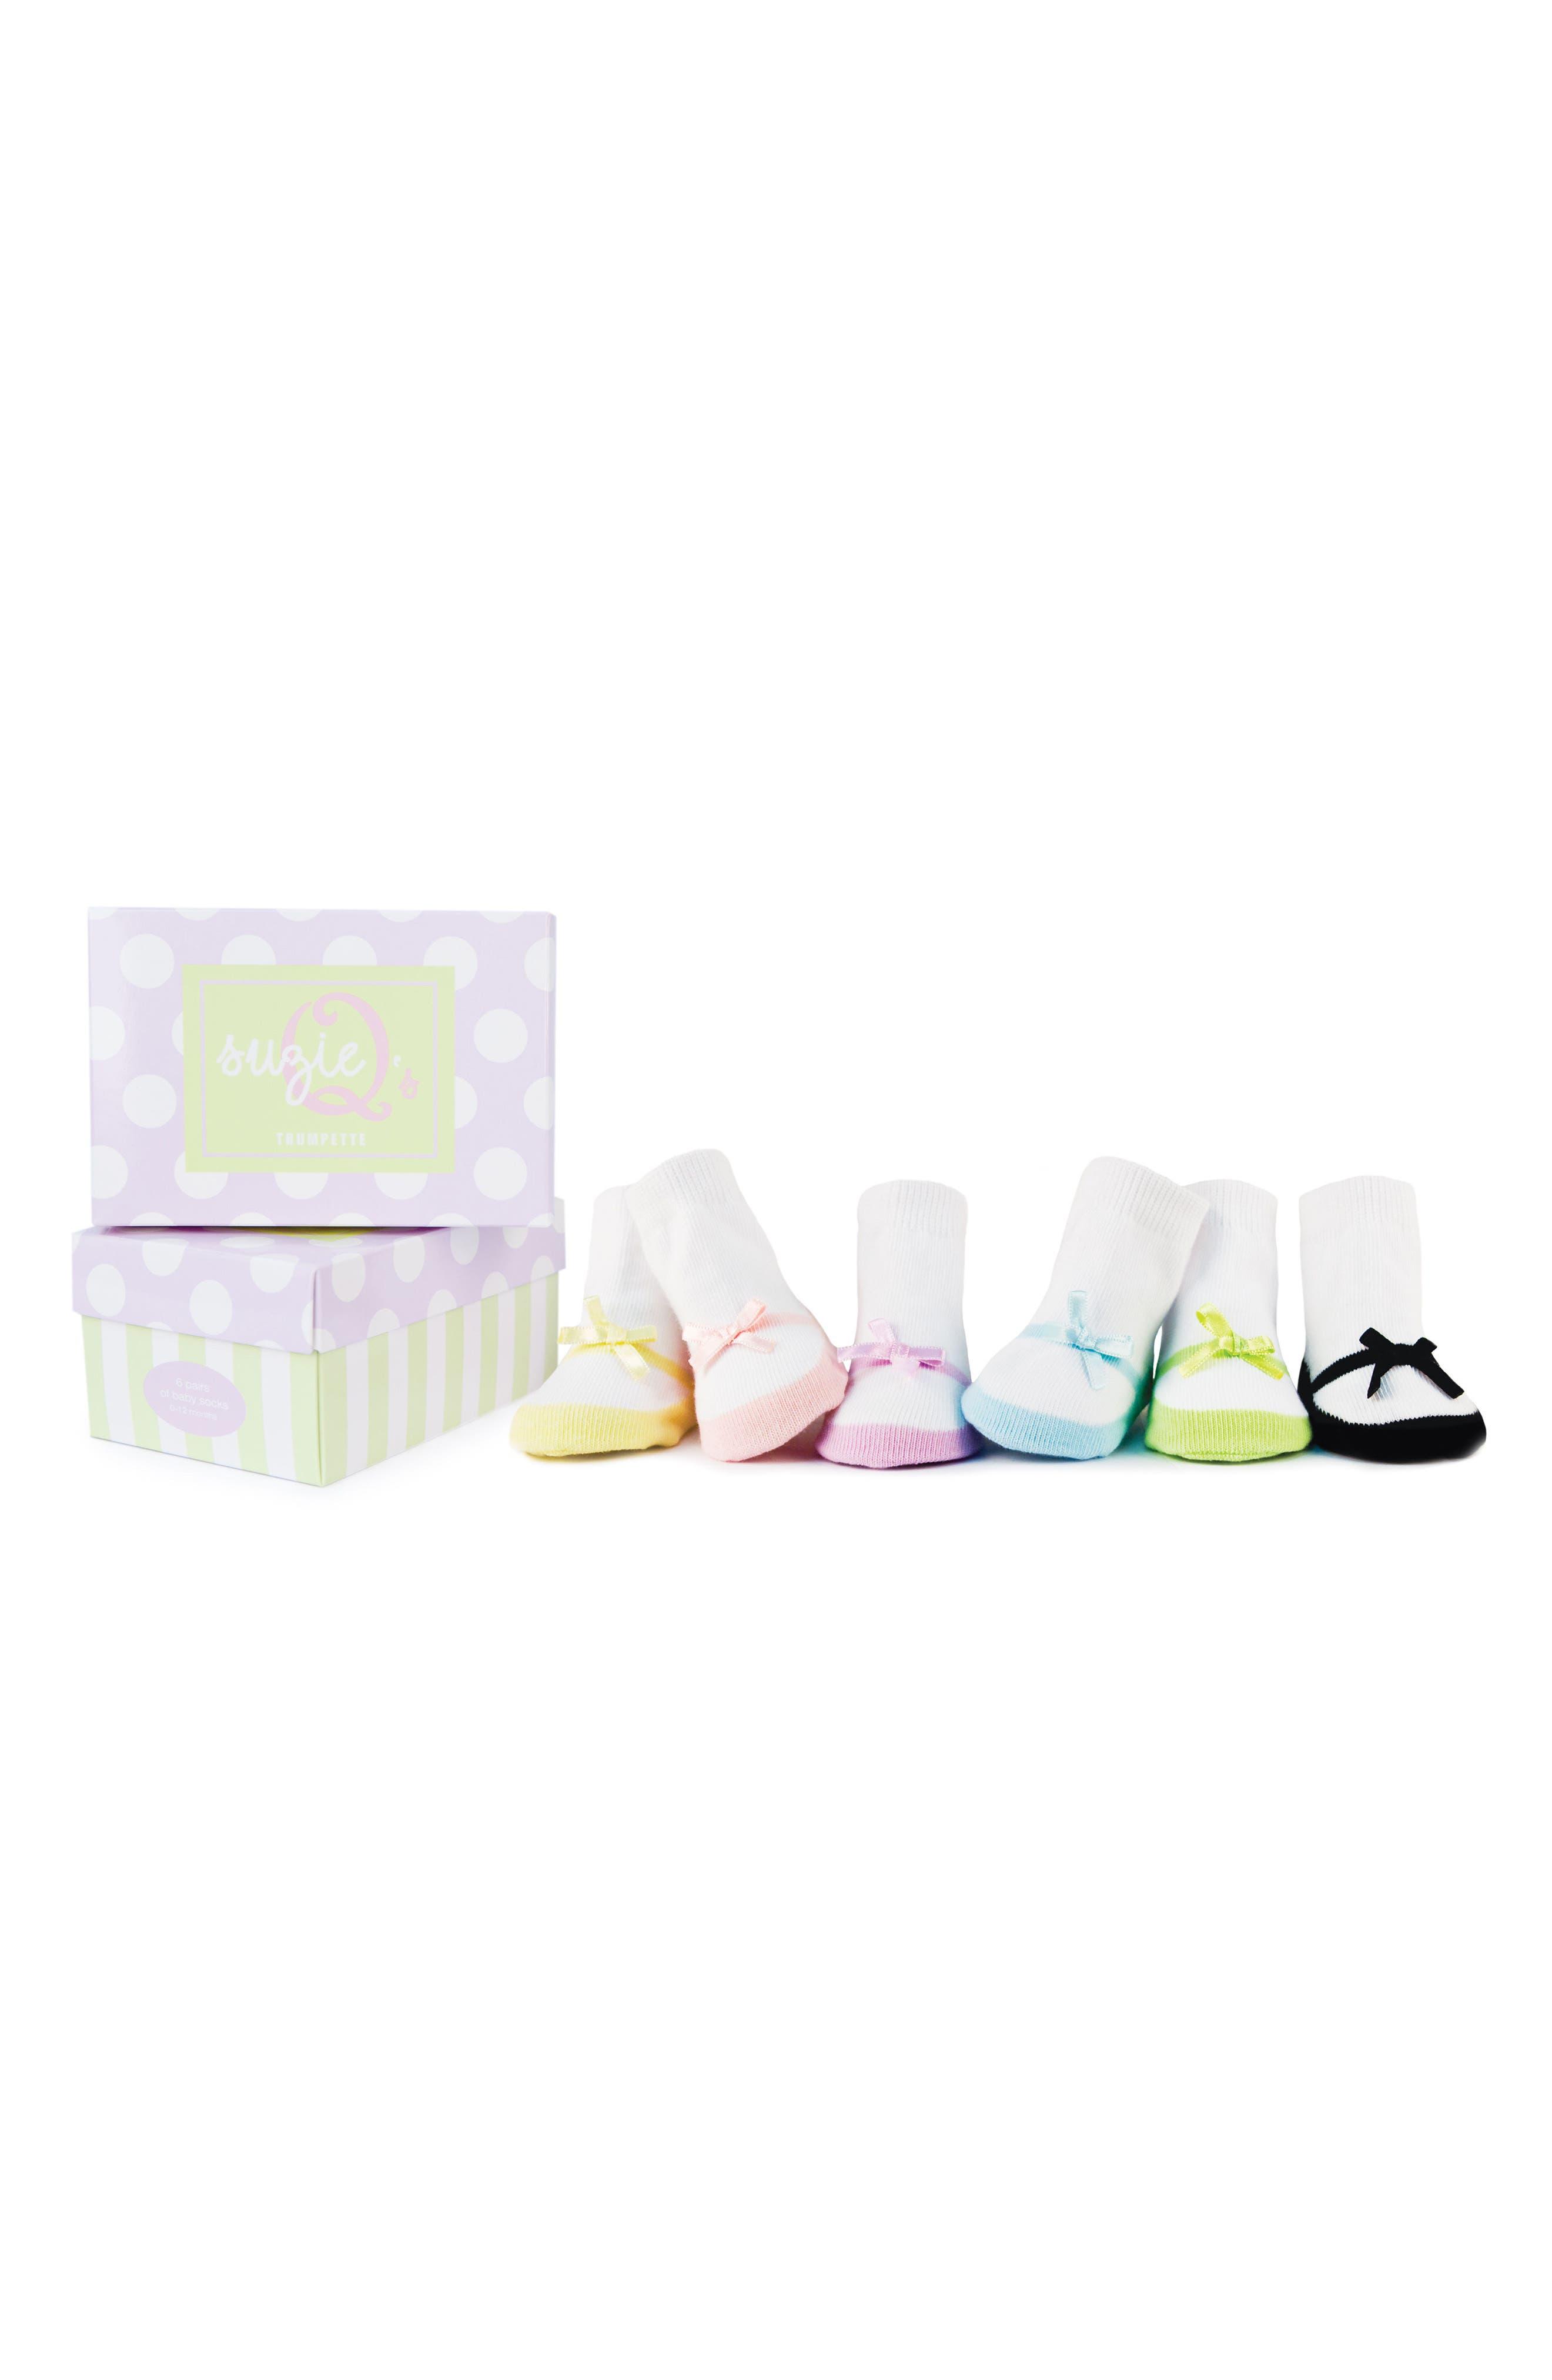 Socks Gift Set,                             Alternate thumbnail 2, color,                             SUZY-B